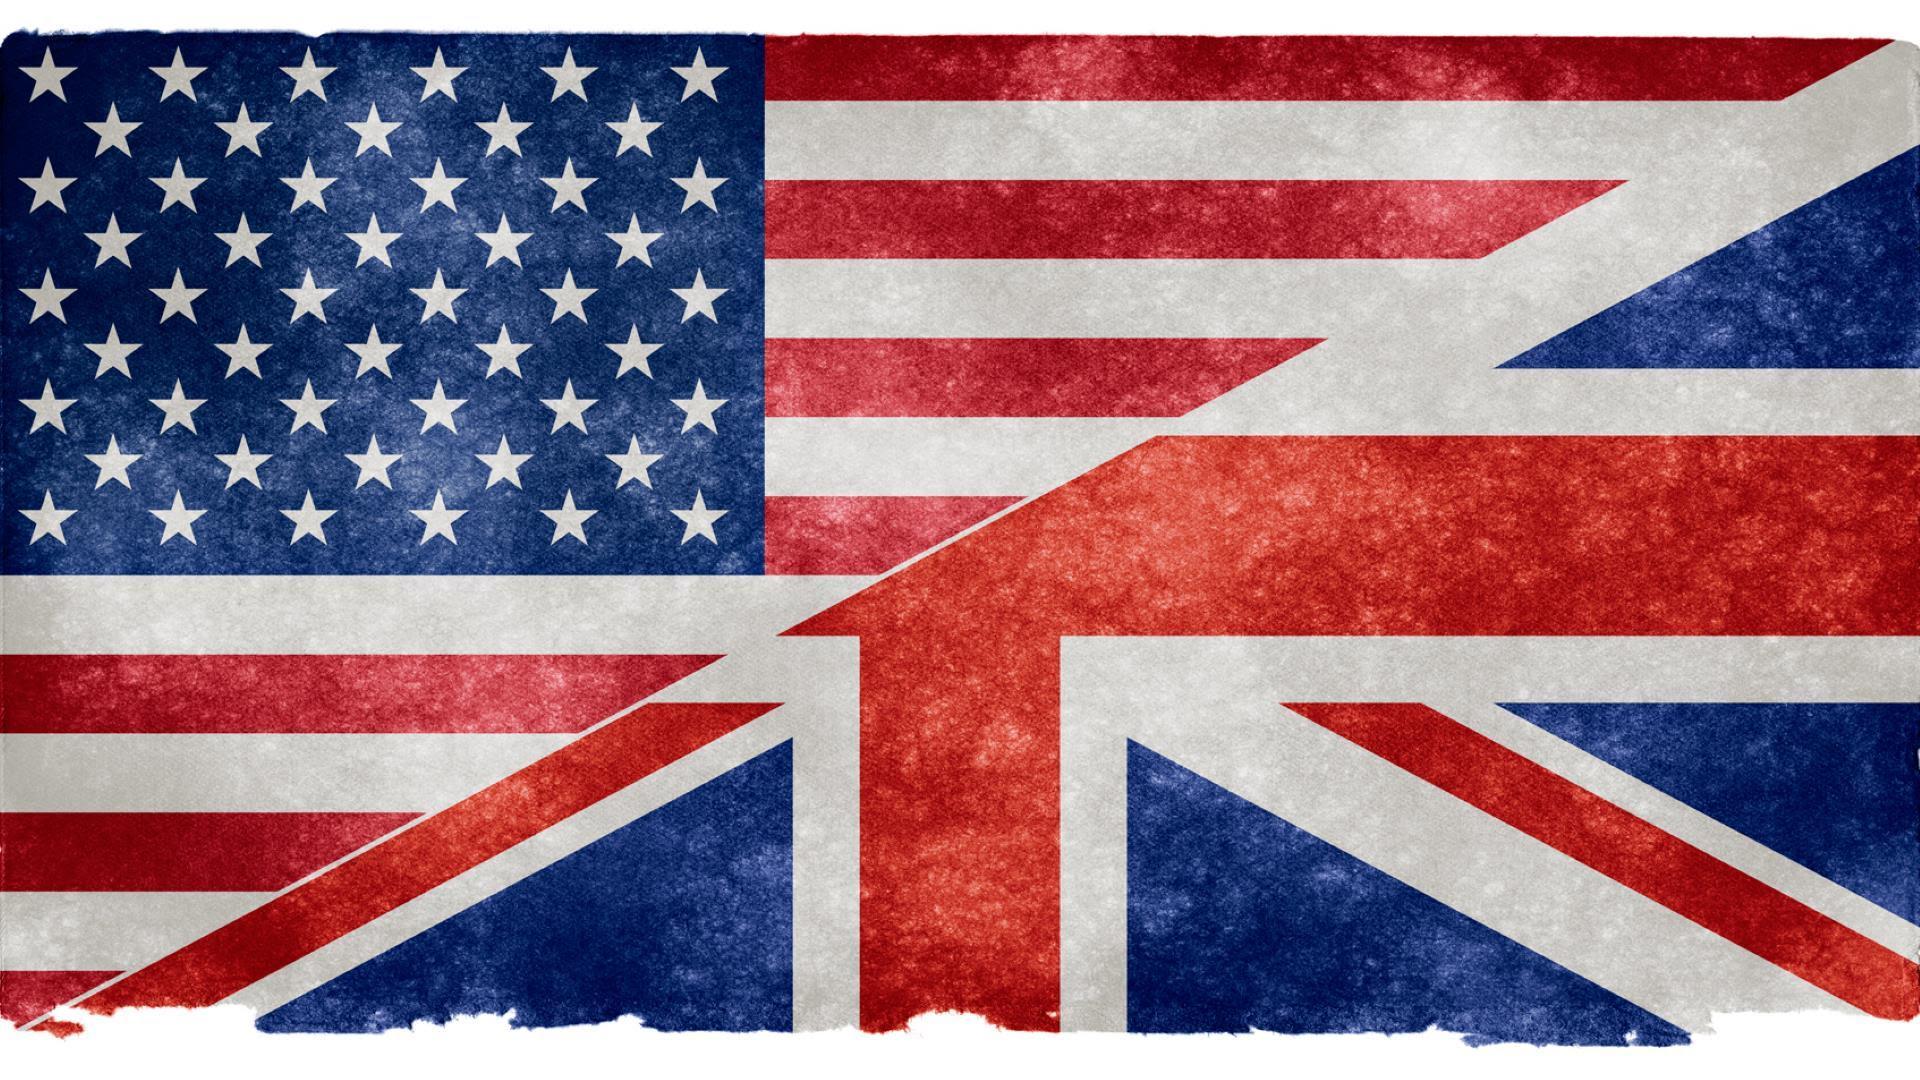 آمریکا+انگلیس+عبارت